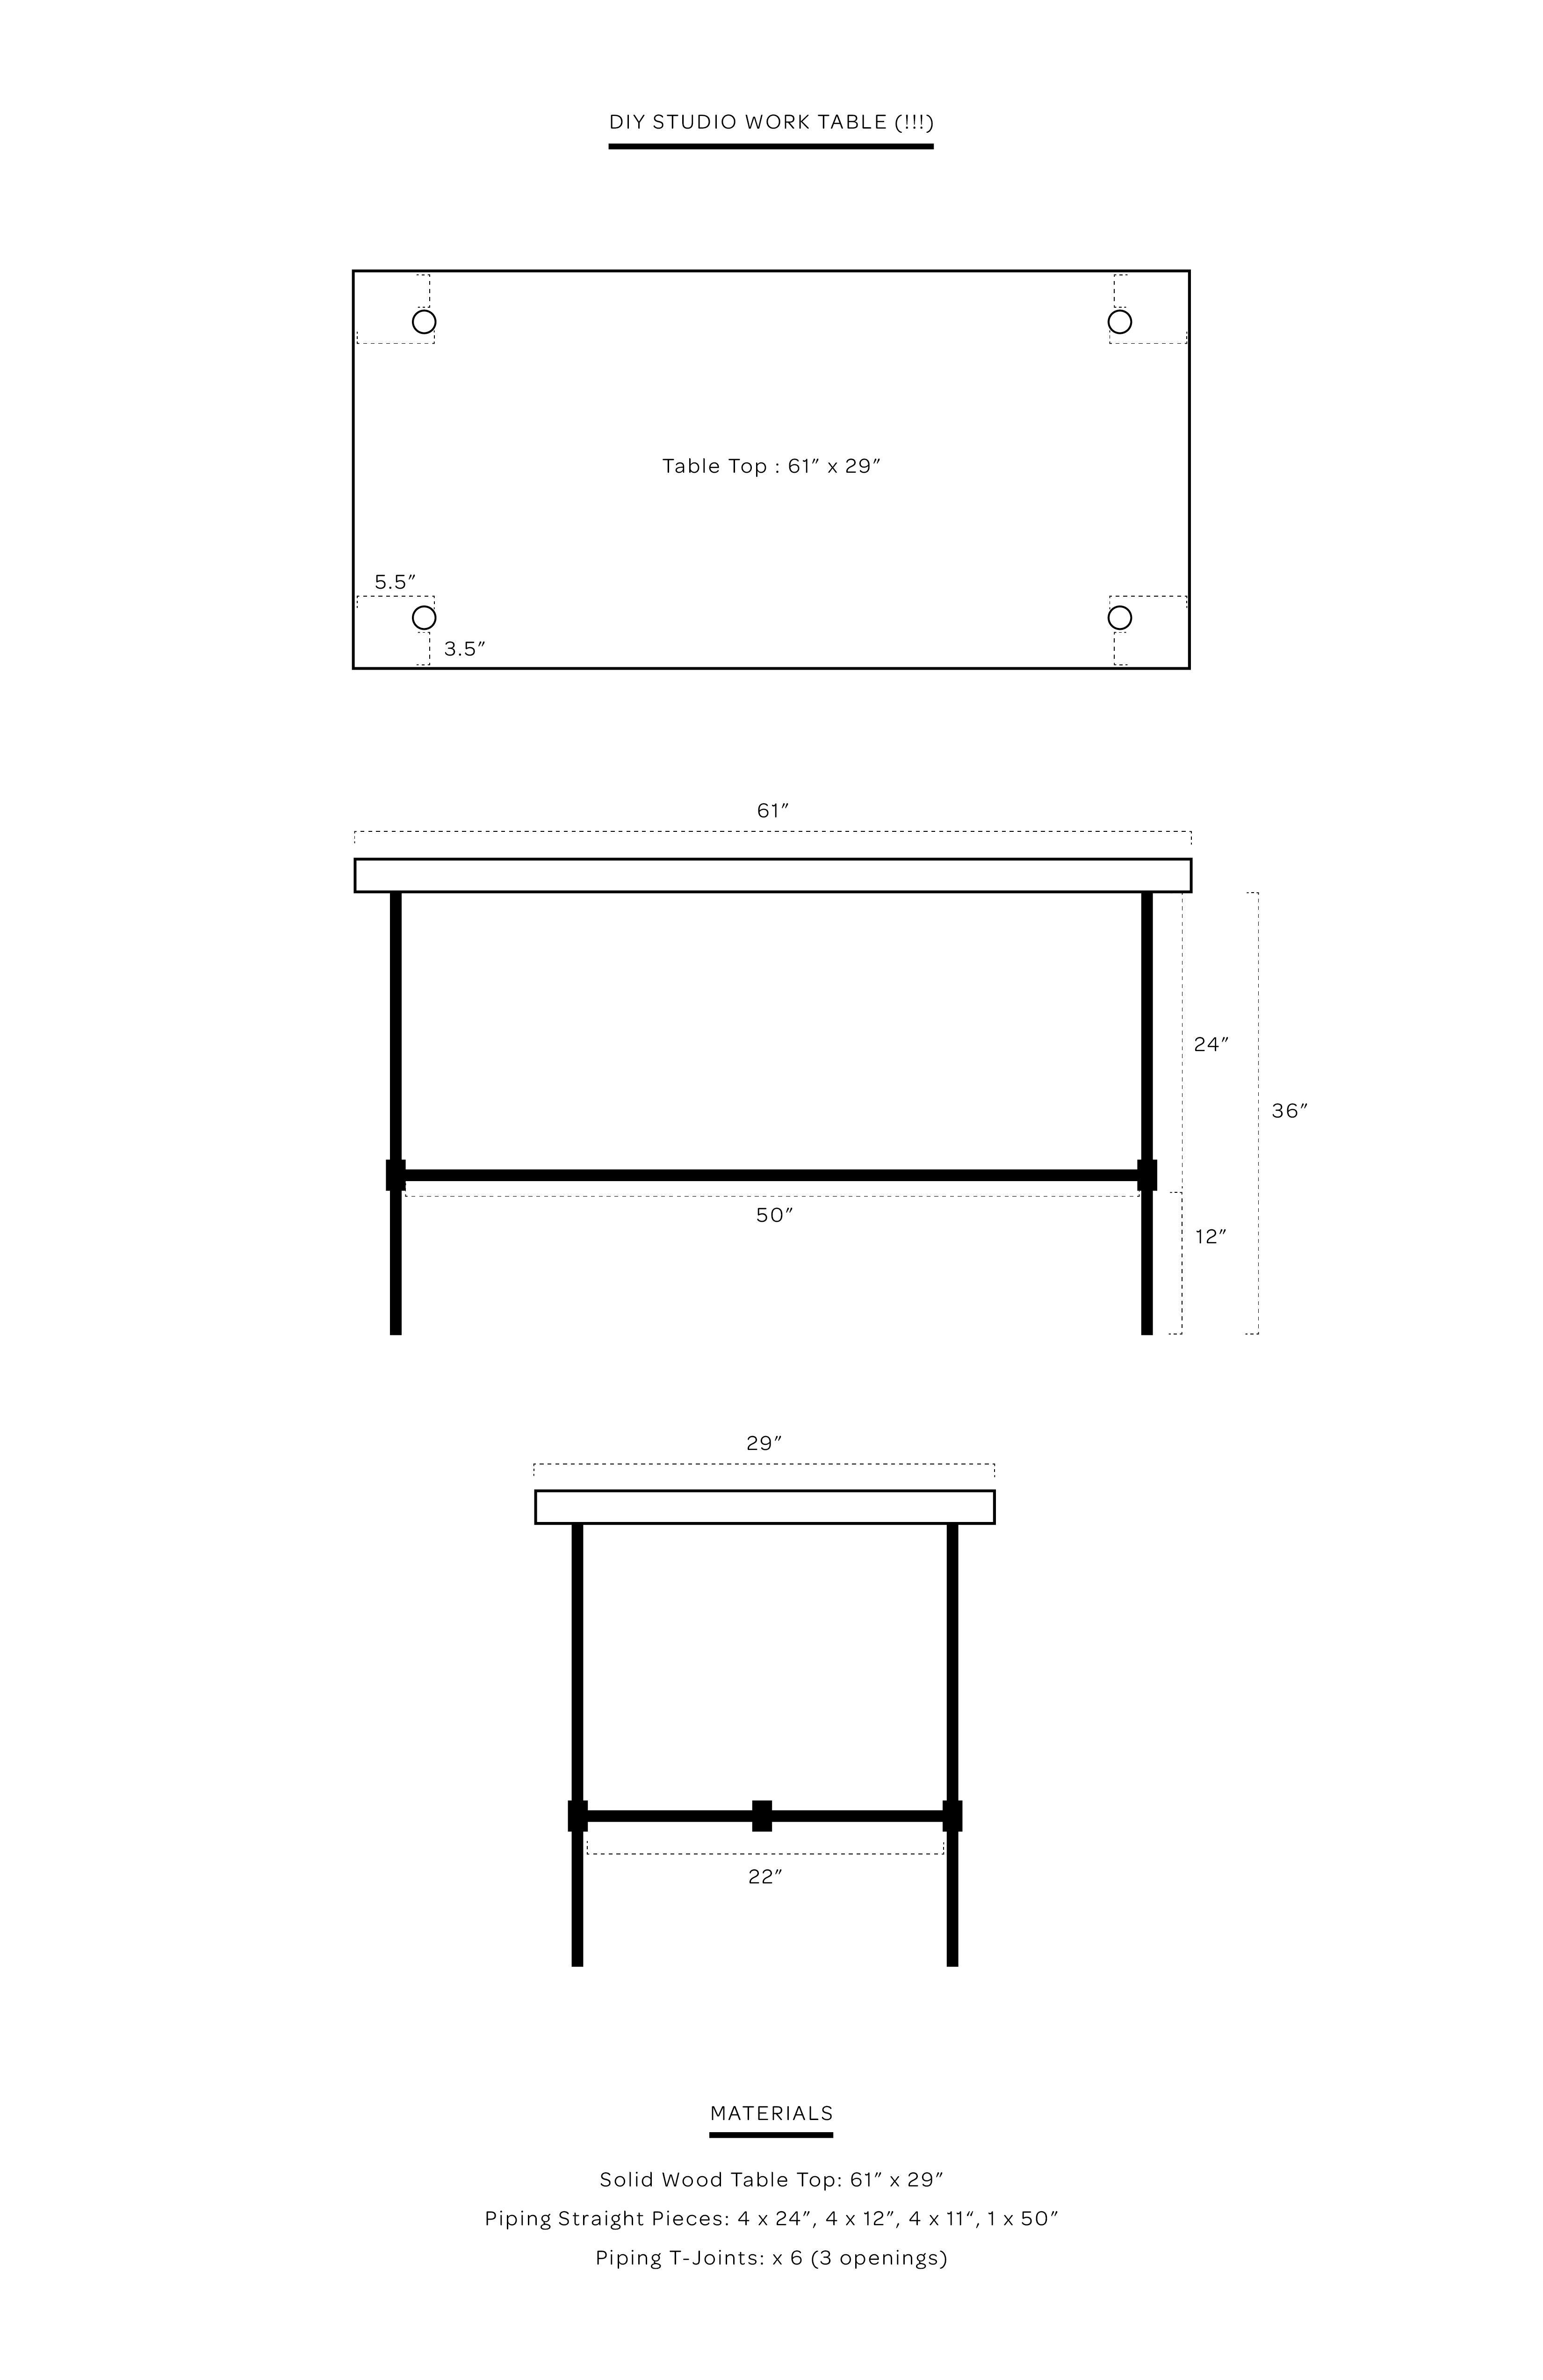 Work table diagram wiring diagram for light switch work table diagram wiring diagram u2022 rh 149 28 103 1 table seating diagram round table diagram greentooth Gallery